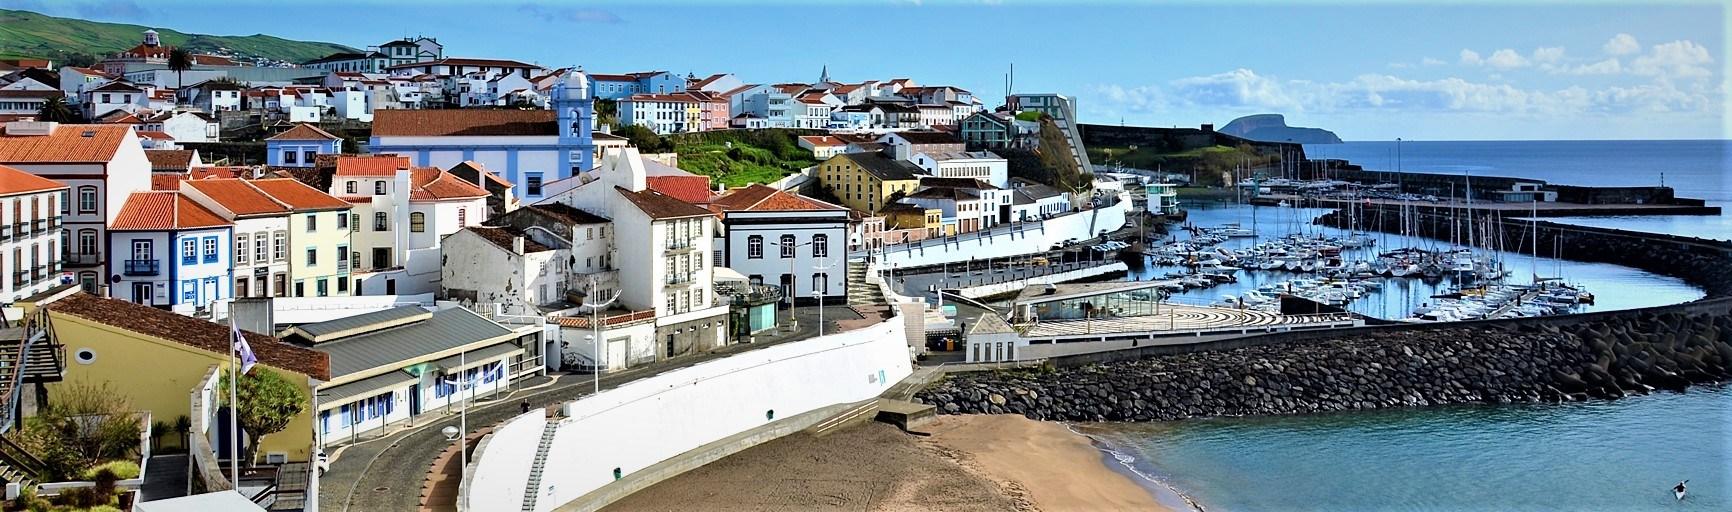 Angra-Heroismo-Terceira-Azores